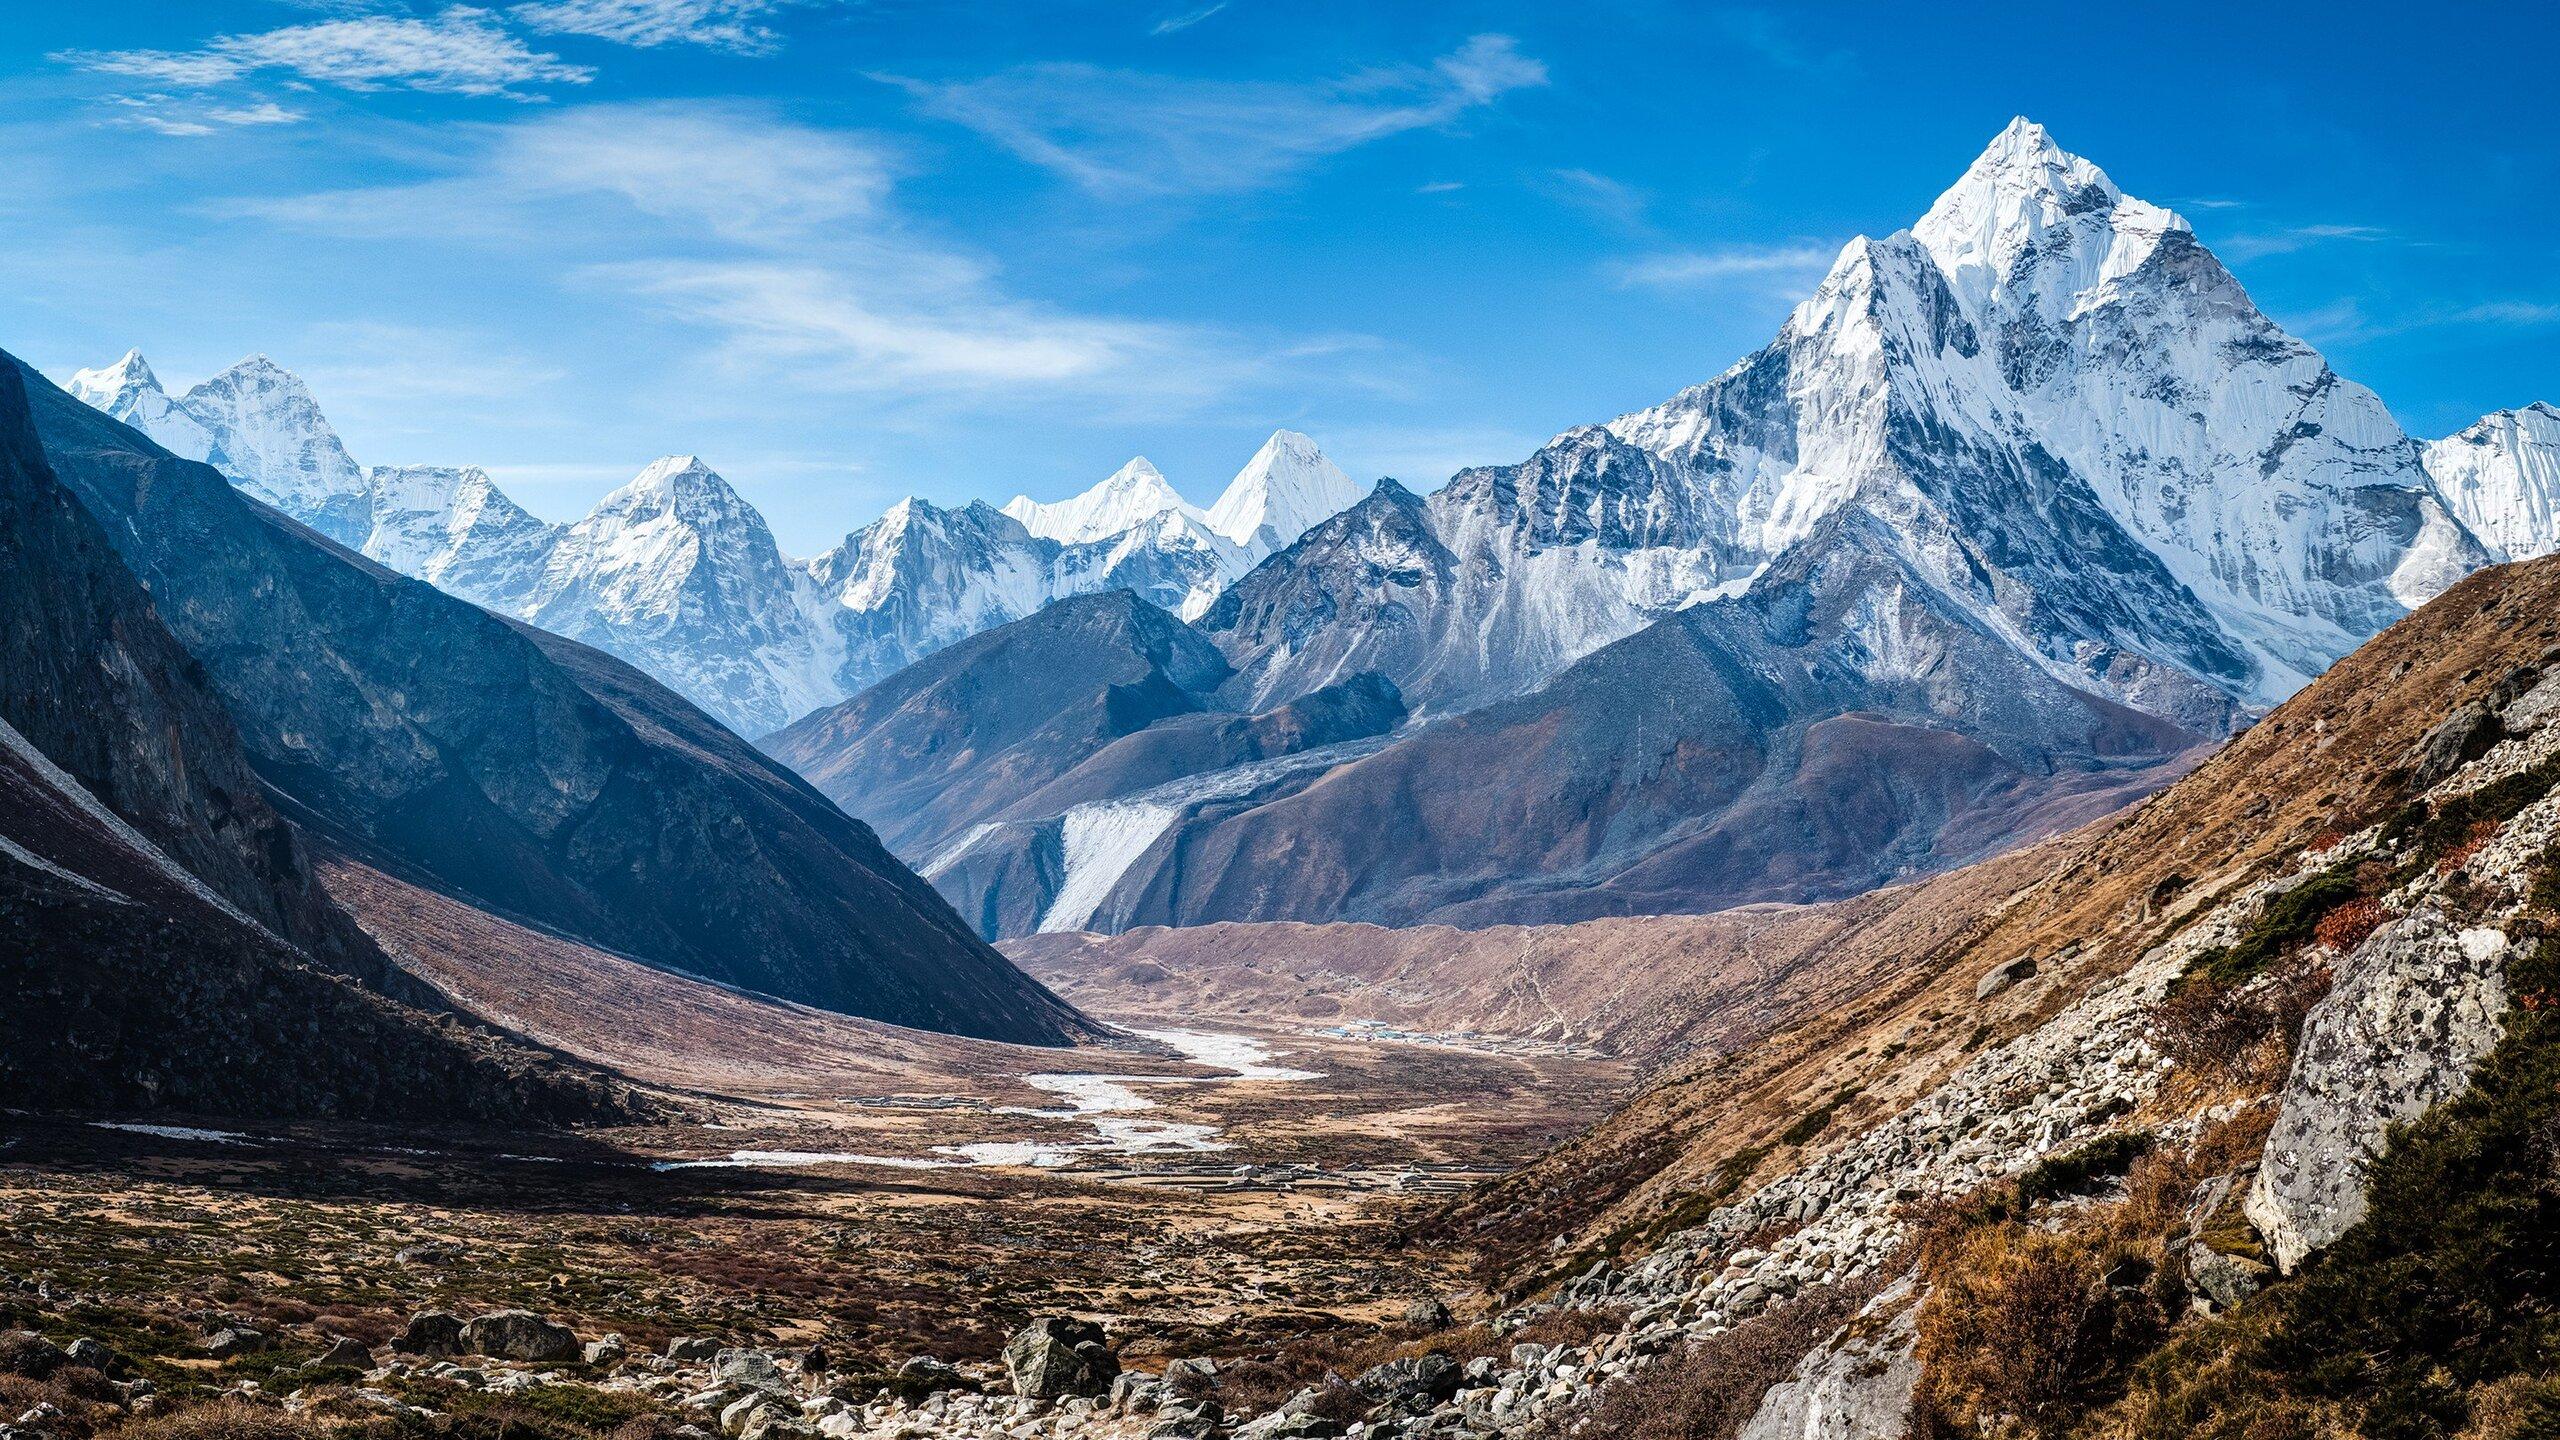 Wonderful Wallpaper Mountain 1440p - himalya-mountains-2560x1440  Photograph_361213.jpg